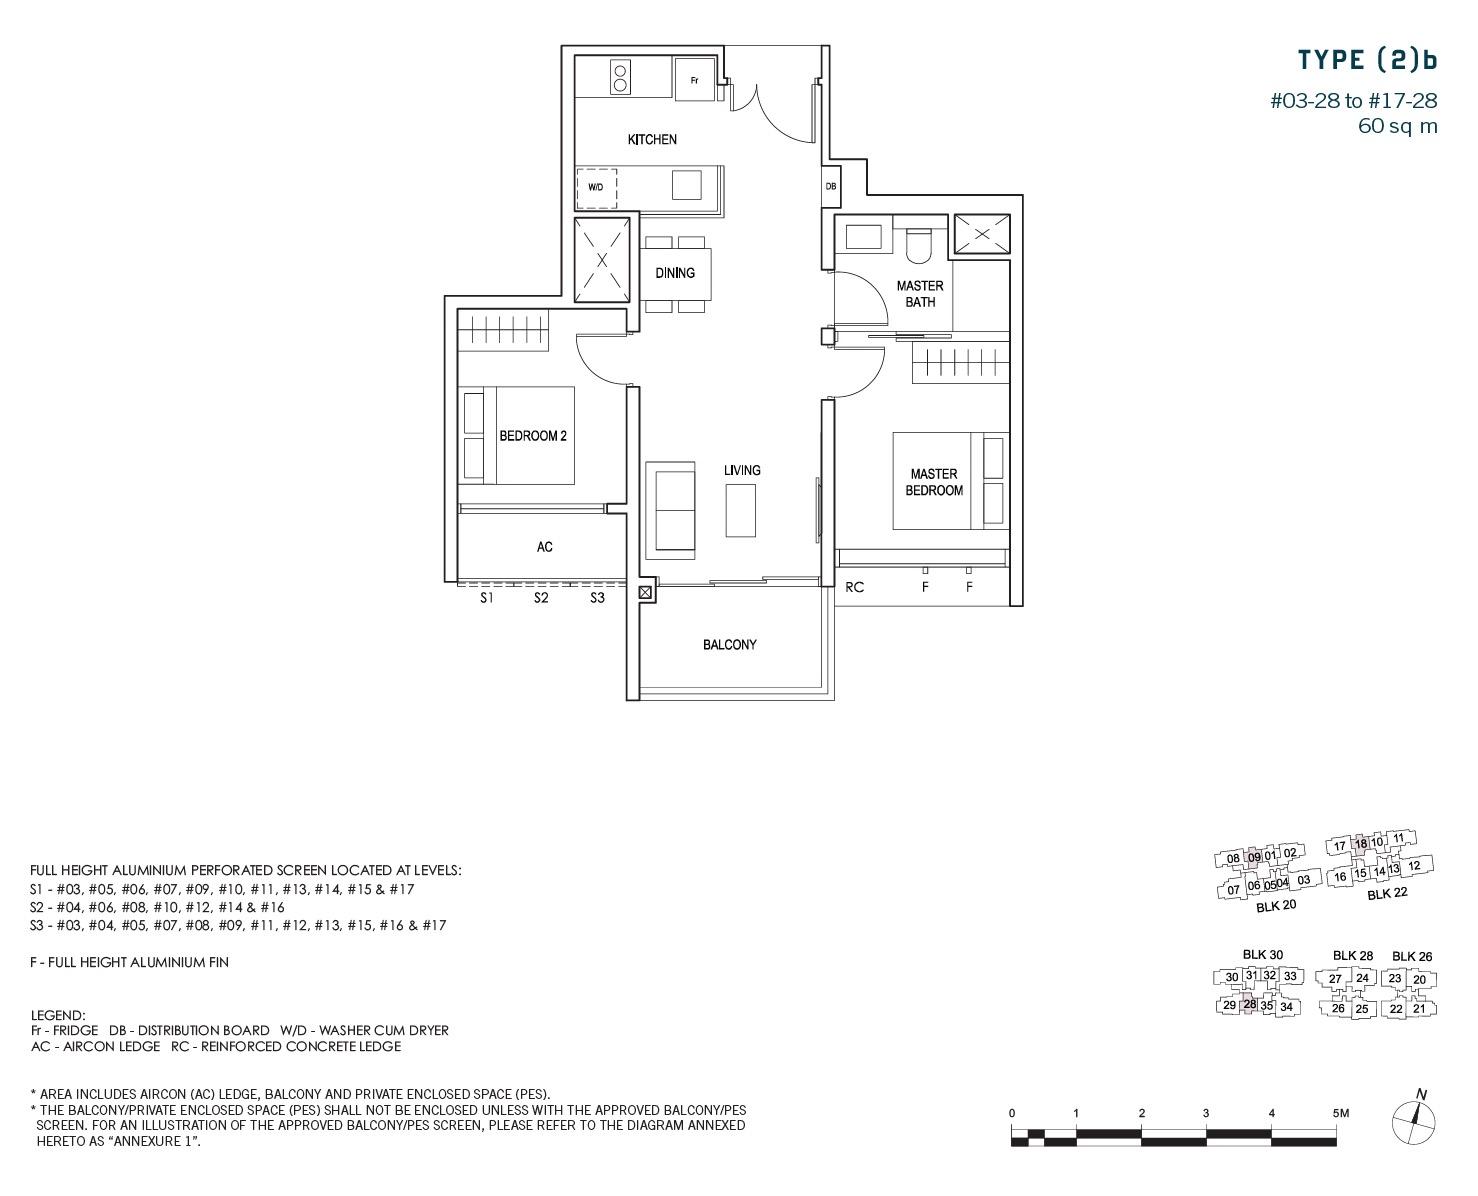 penrose-sims-floorplan 2BR 1Bath B